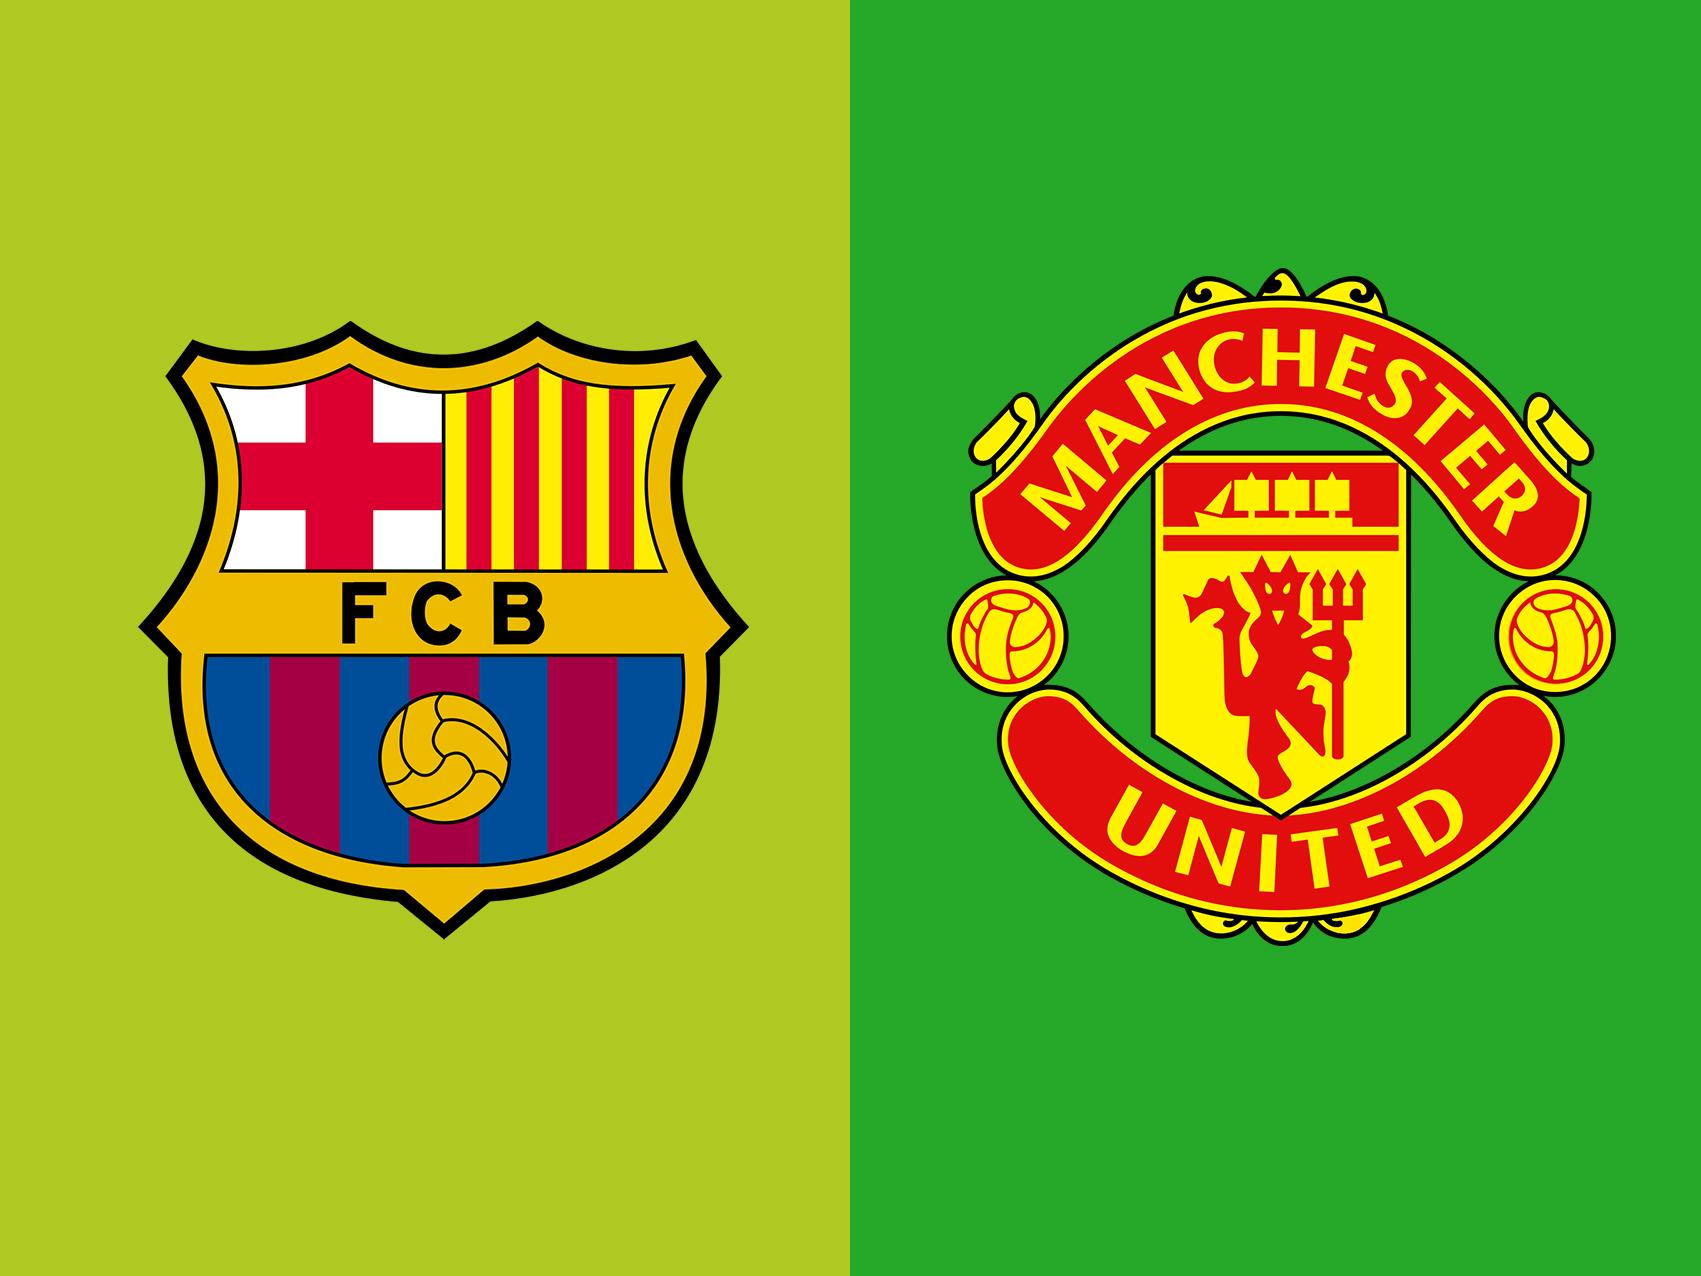 soi-keo-ca-cuoc-bong-da-ngay-17-4-slavia-praha-vs-Manchester United-cong-pha-phao-dai-b9 1